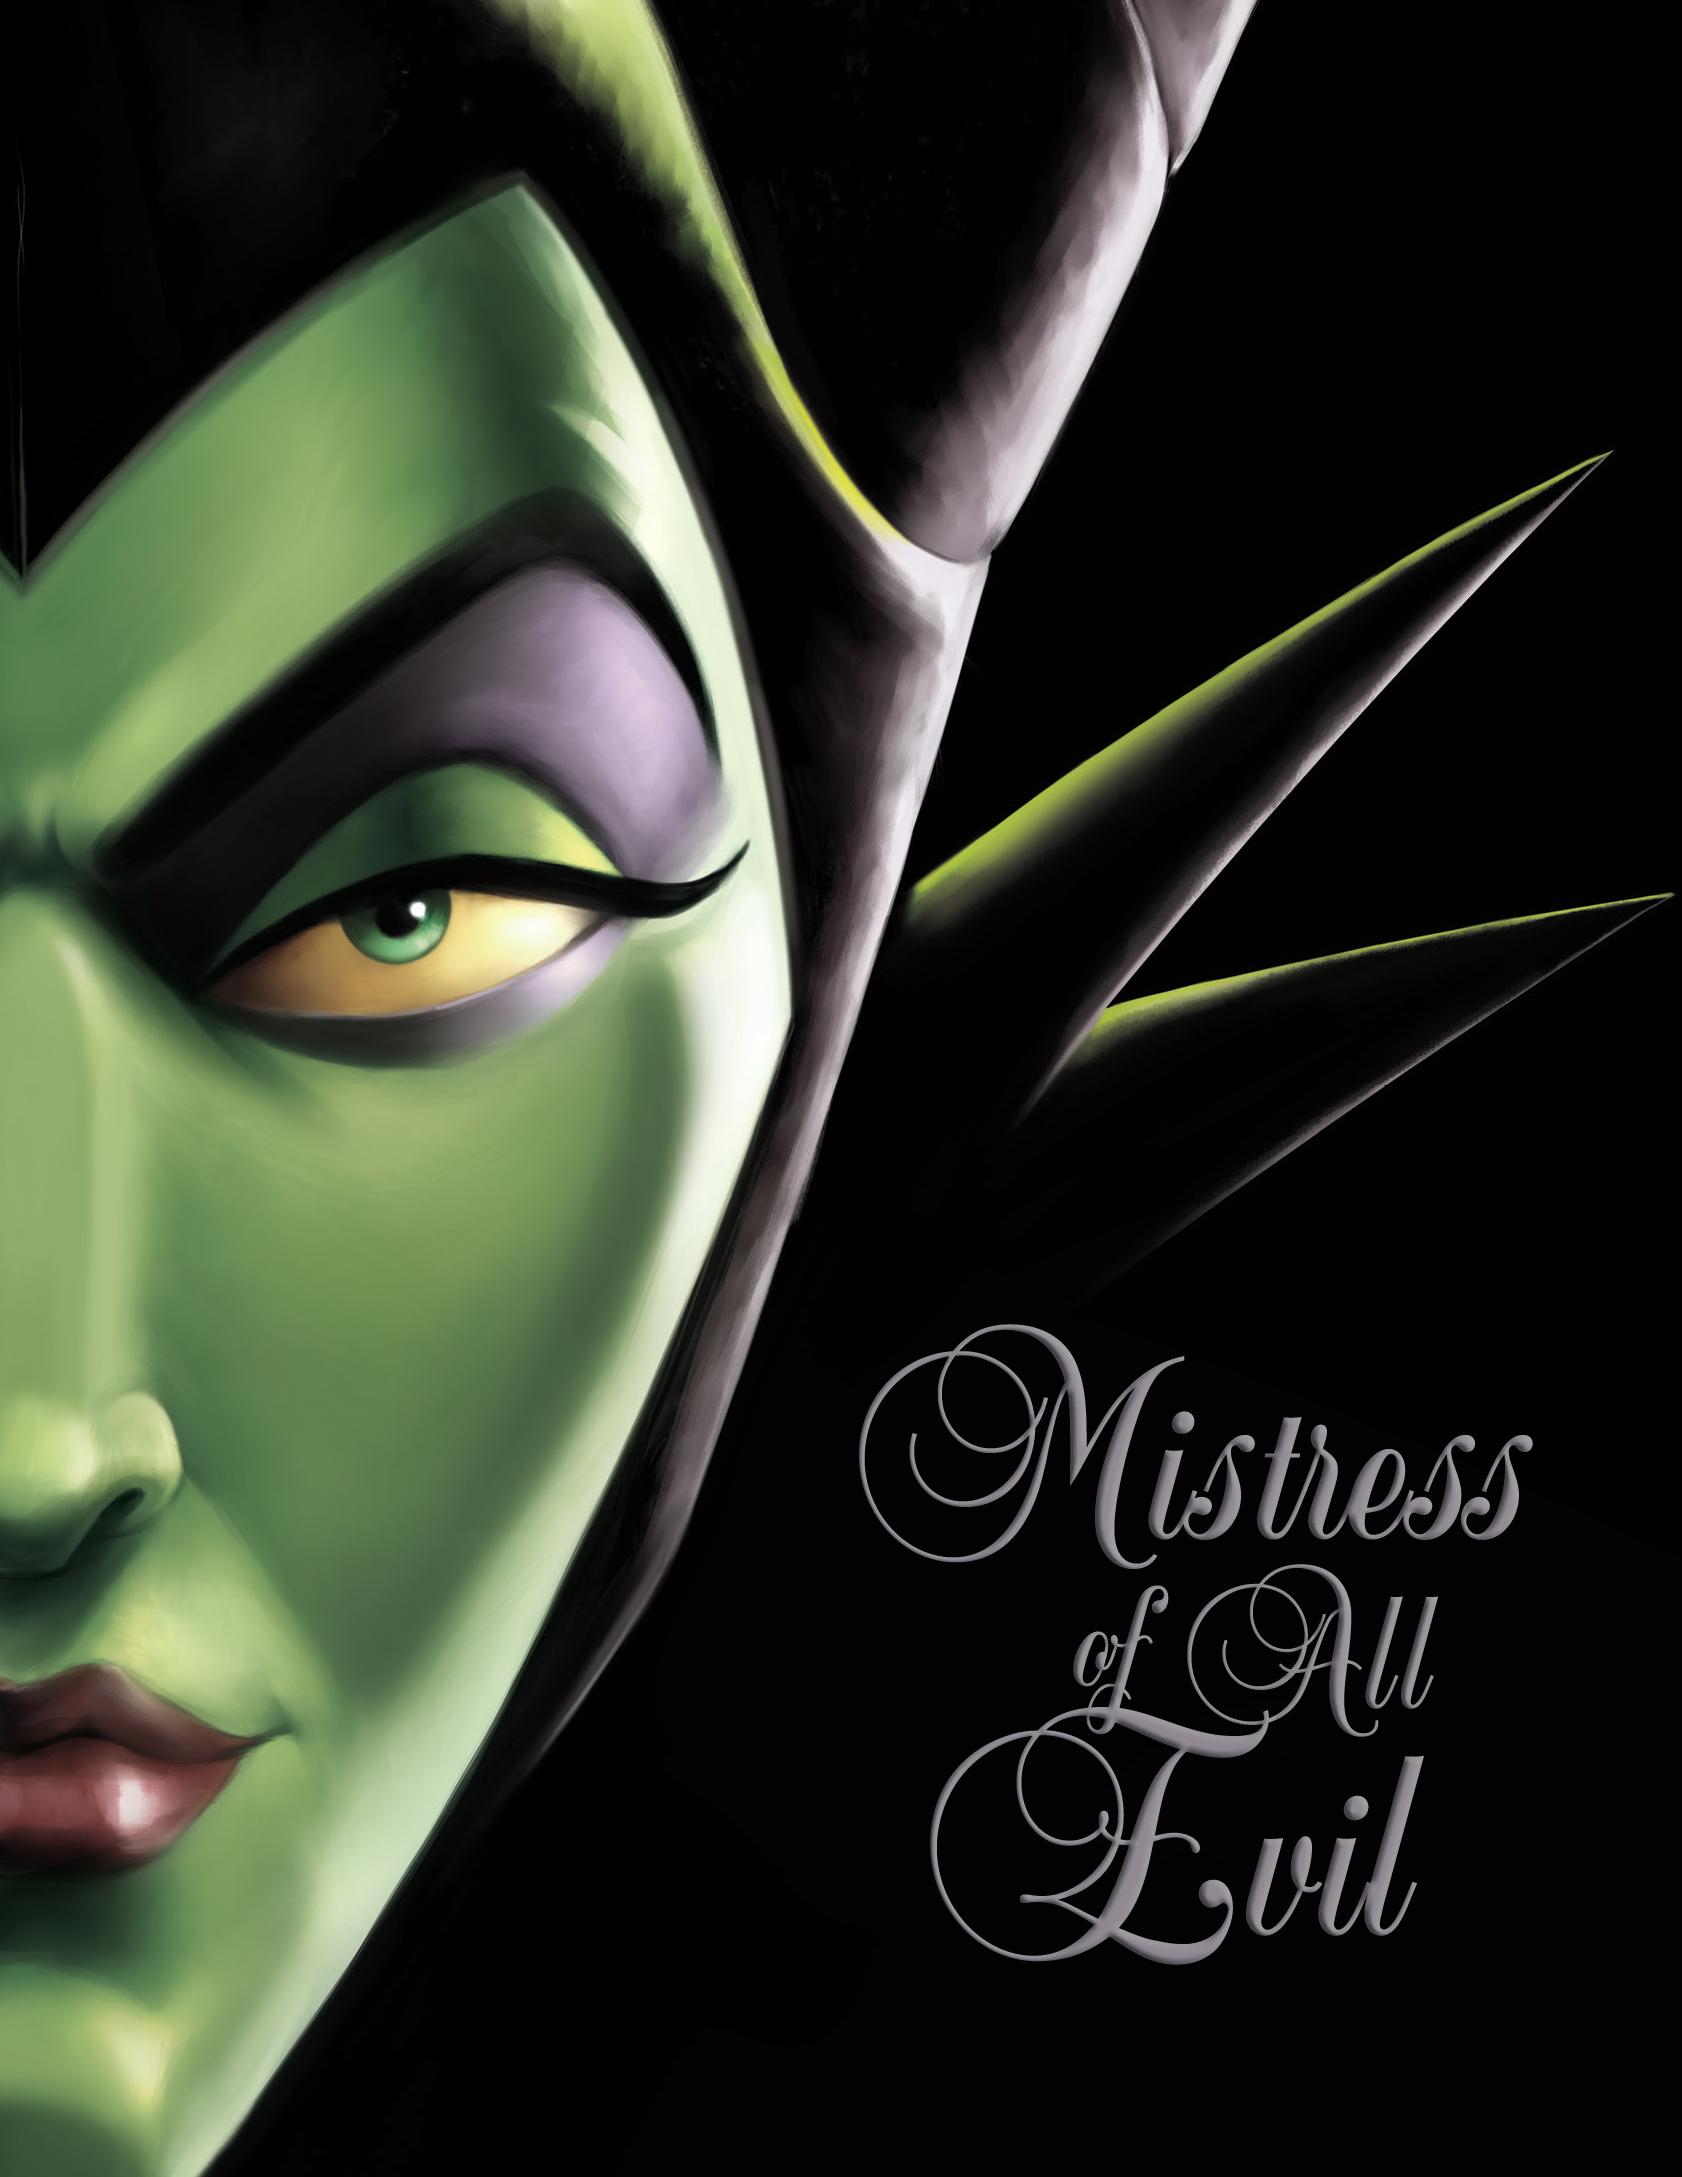 JKT_Mistress of All Evil_FINAL